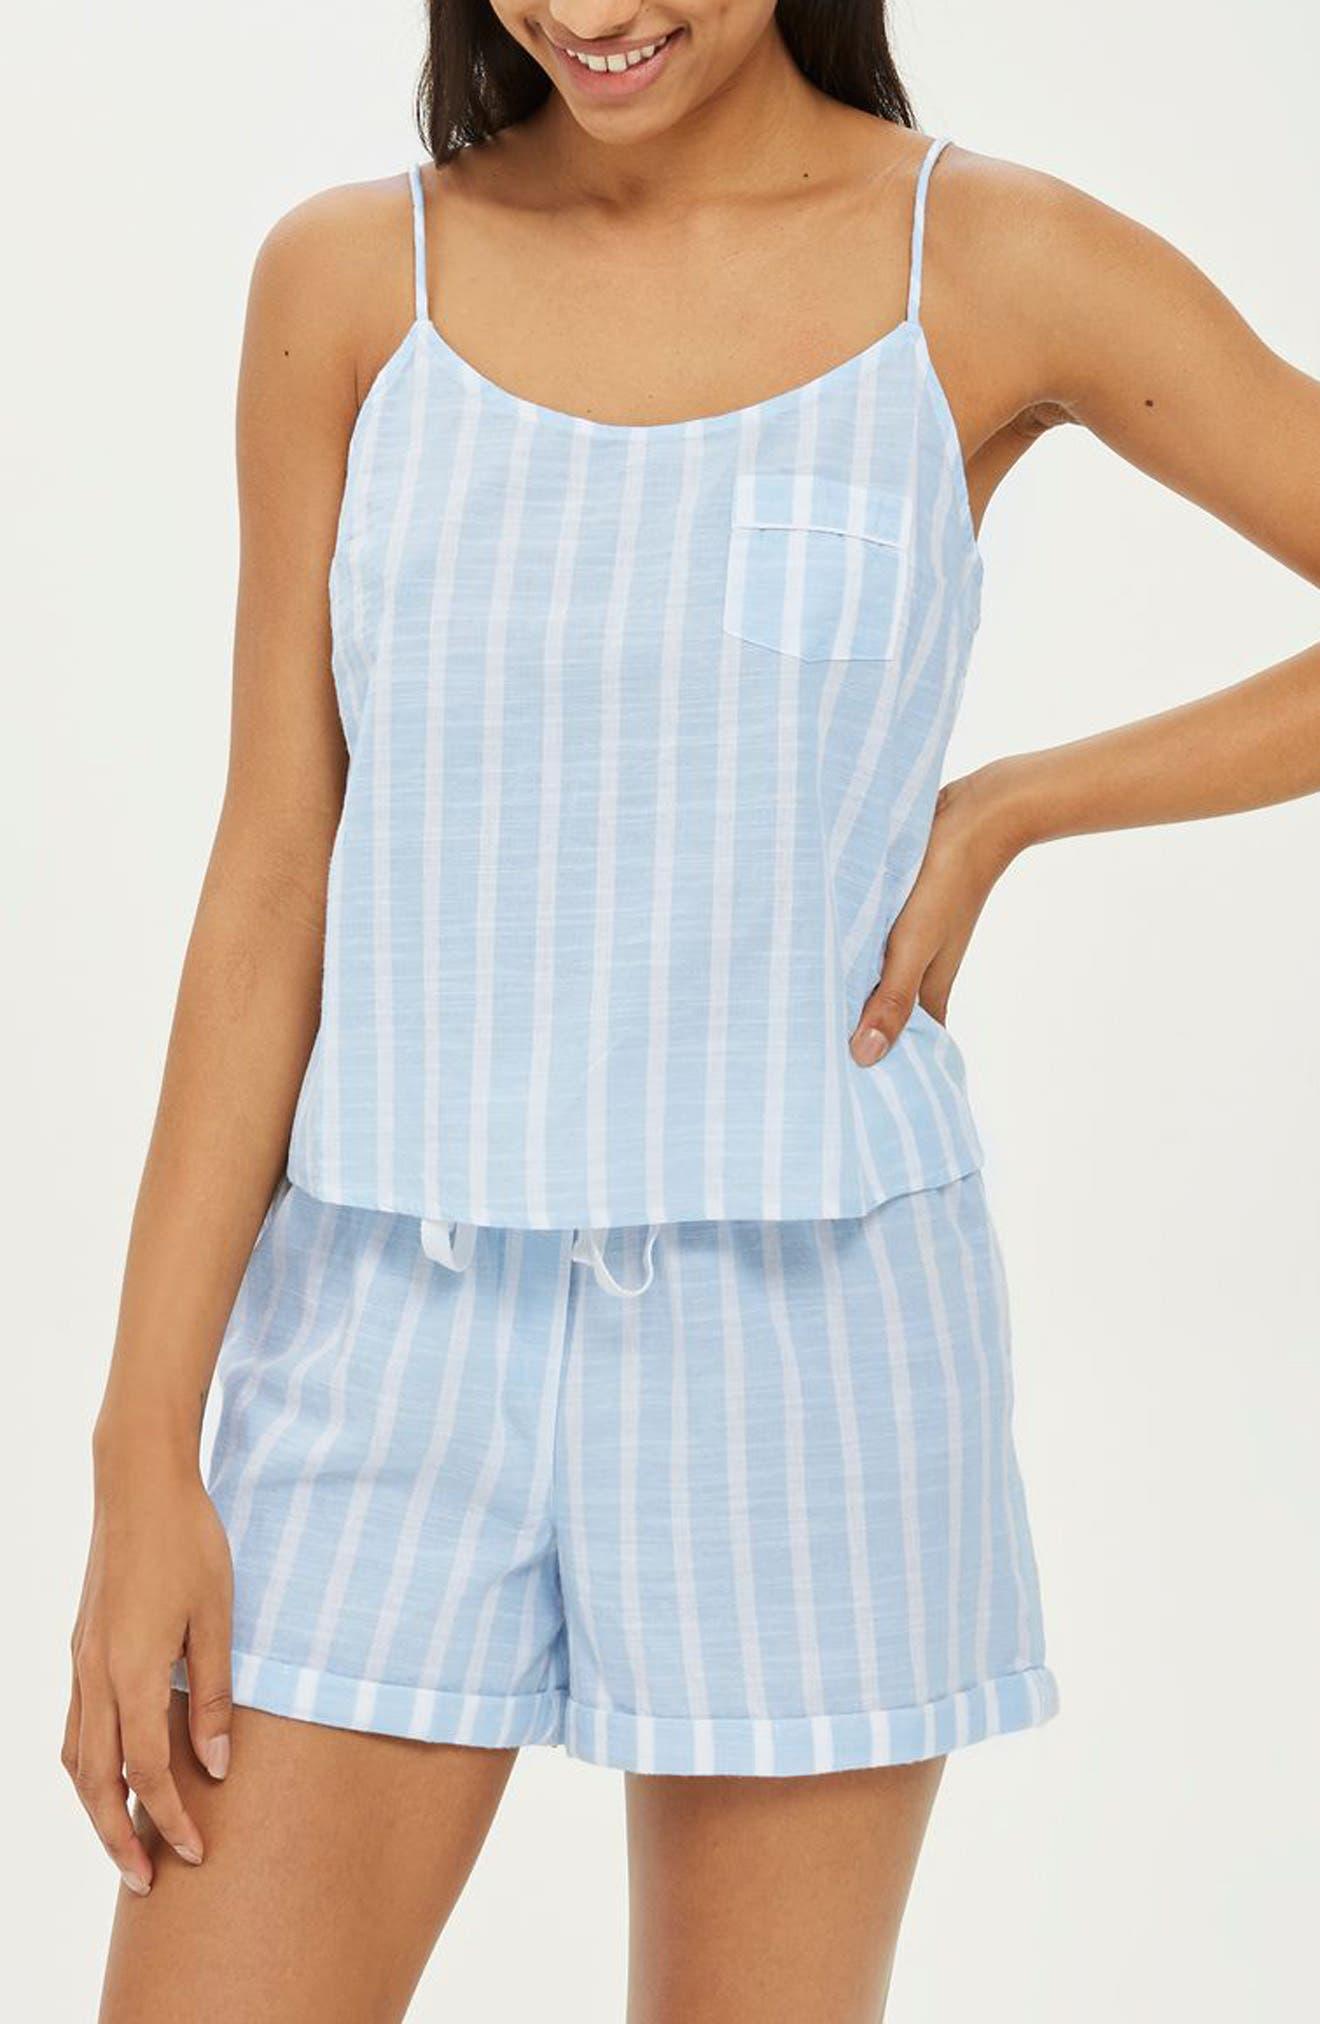 Stripe Camisole Pajama Top,                             Main thumbnail 1, color,                             LIGHT BLUE